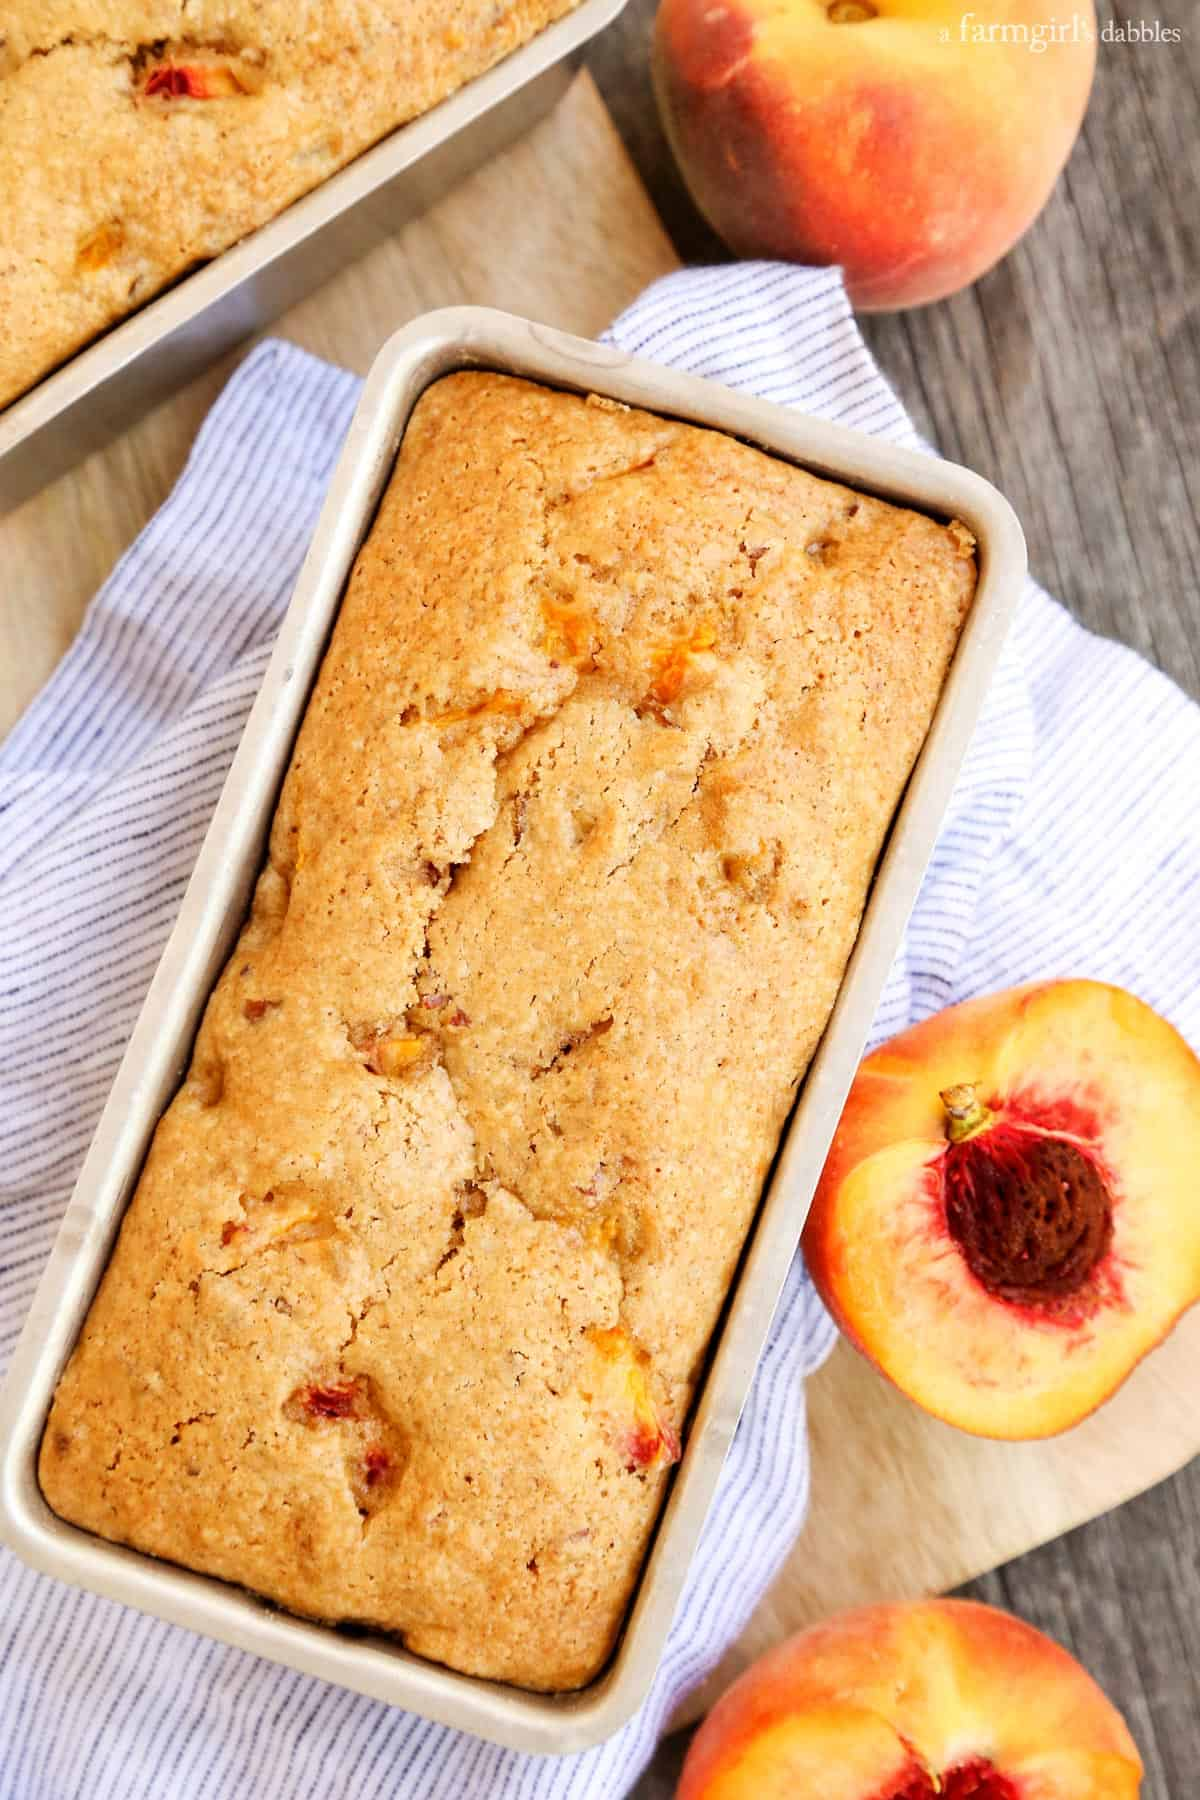 Peach Bread from afarmgirlsdabbles.com